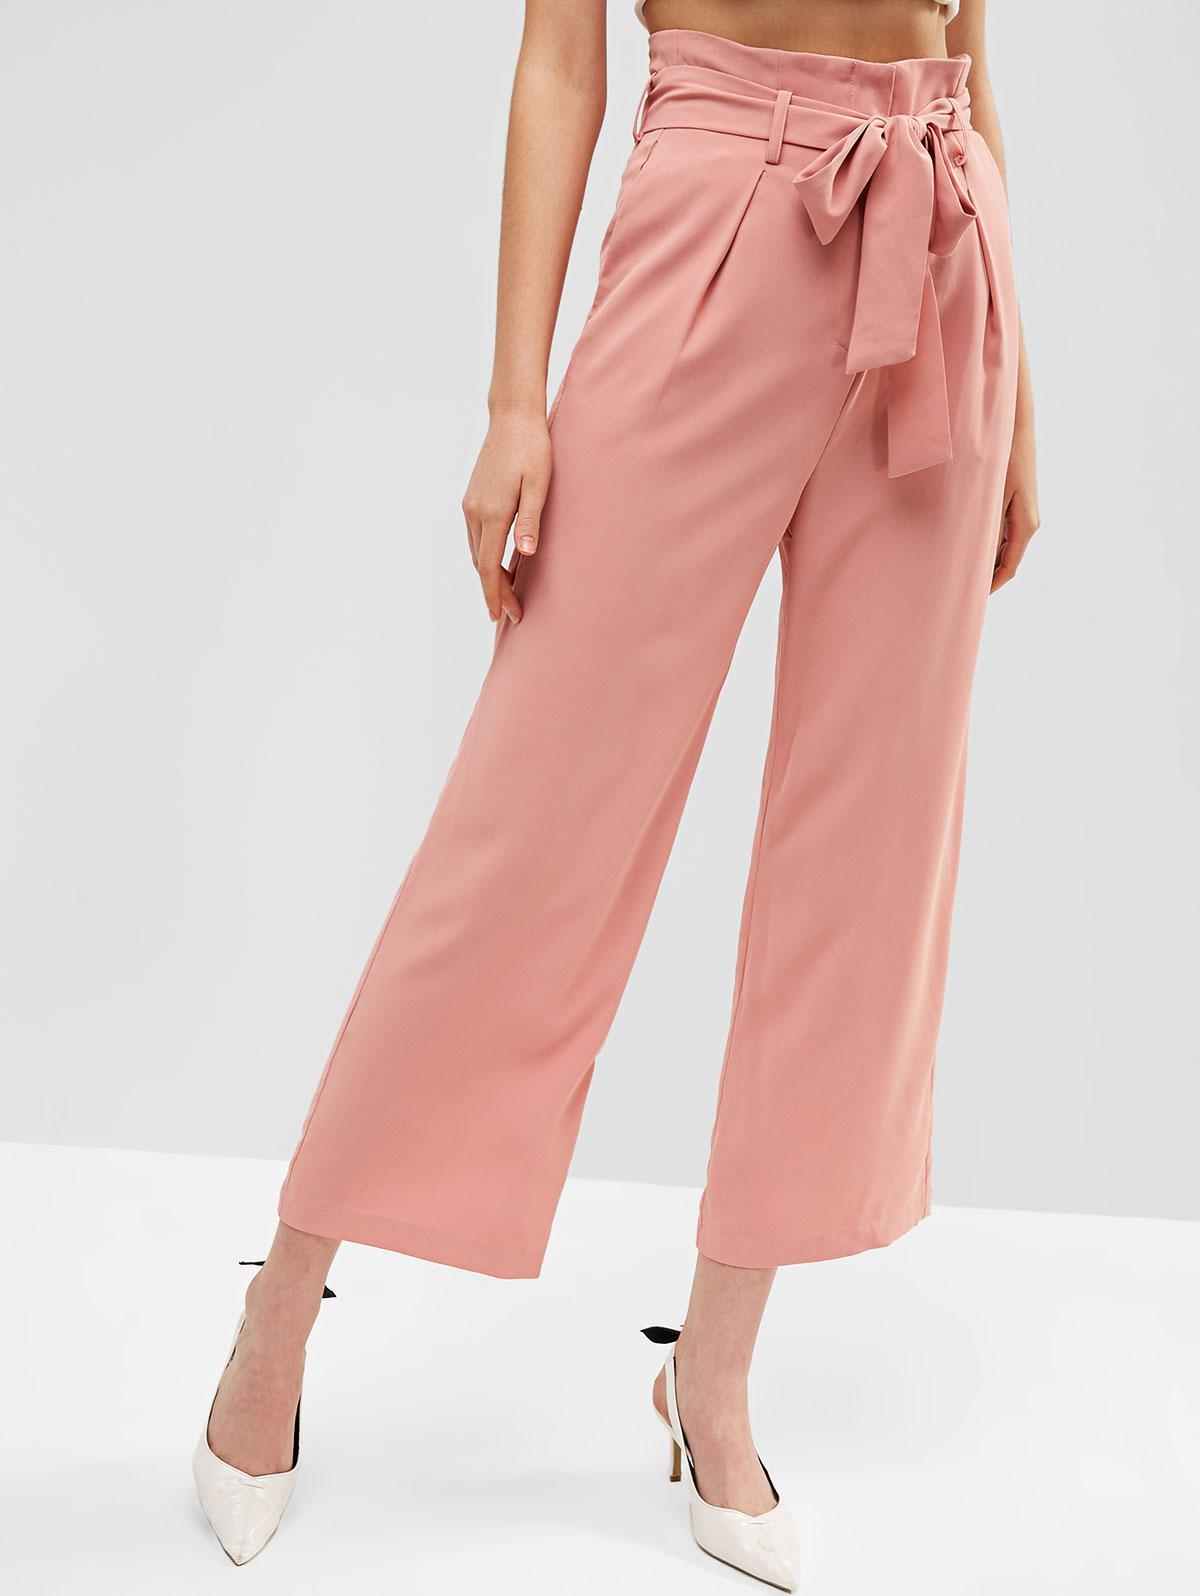 ZAFUL Pockets Belted High Waisted Wide Leg Pants, Rose